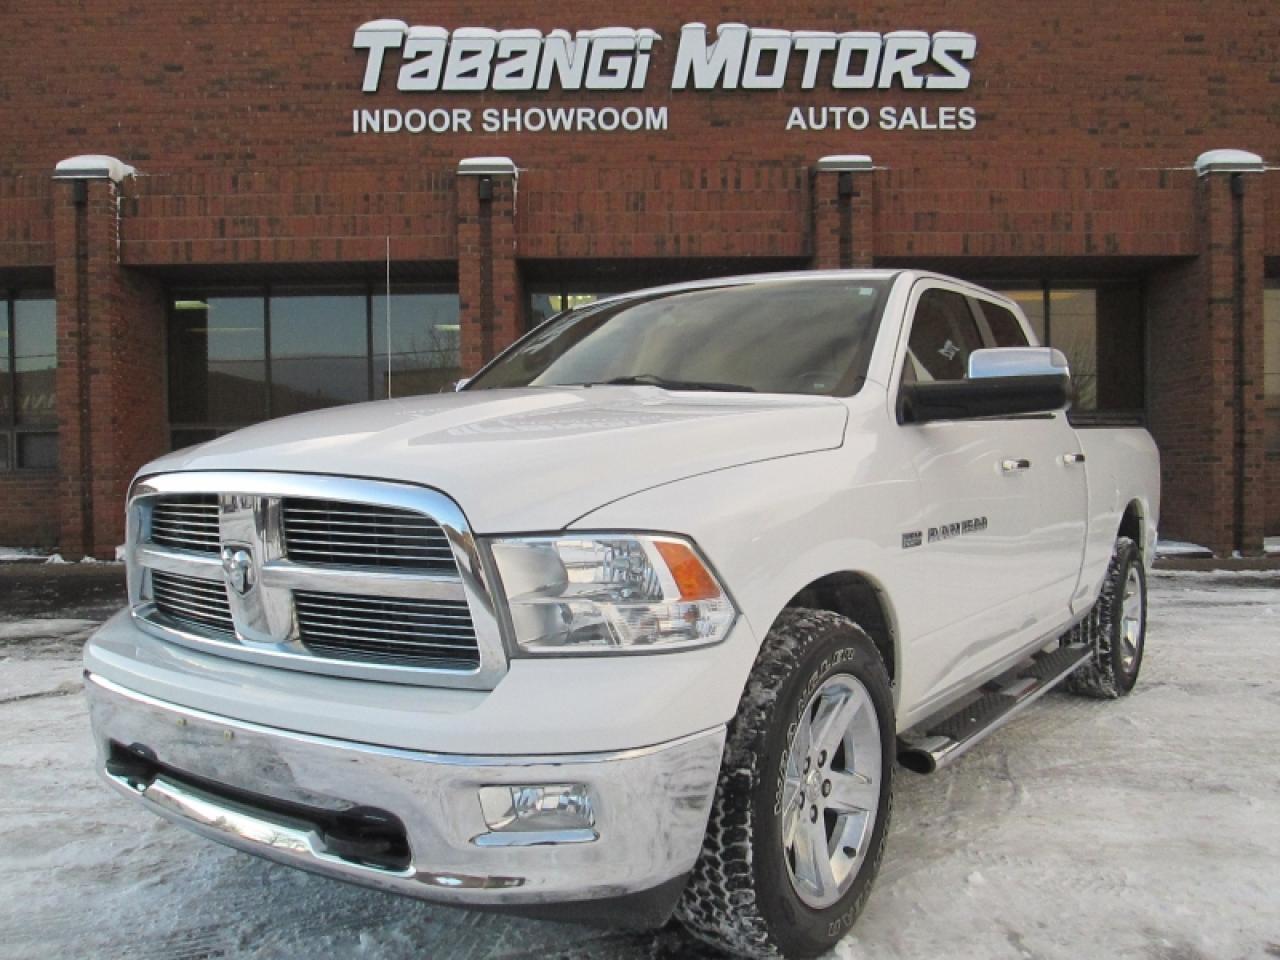 2011 Dodge Ram 1500 BIG HORN | 4X4 | HEMI | BLUETOOTH | CHROME RIMS |